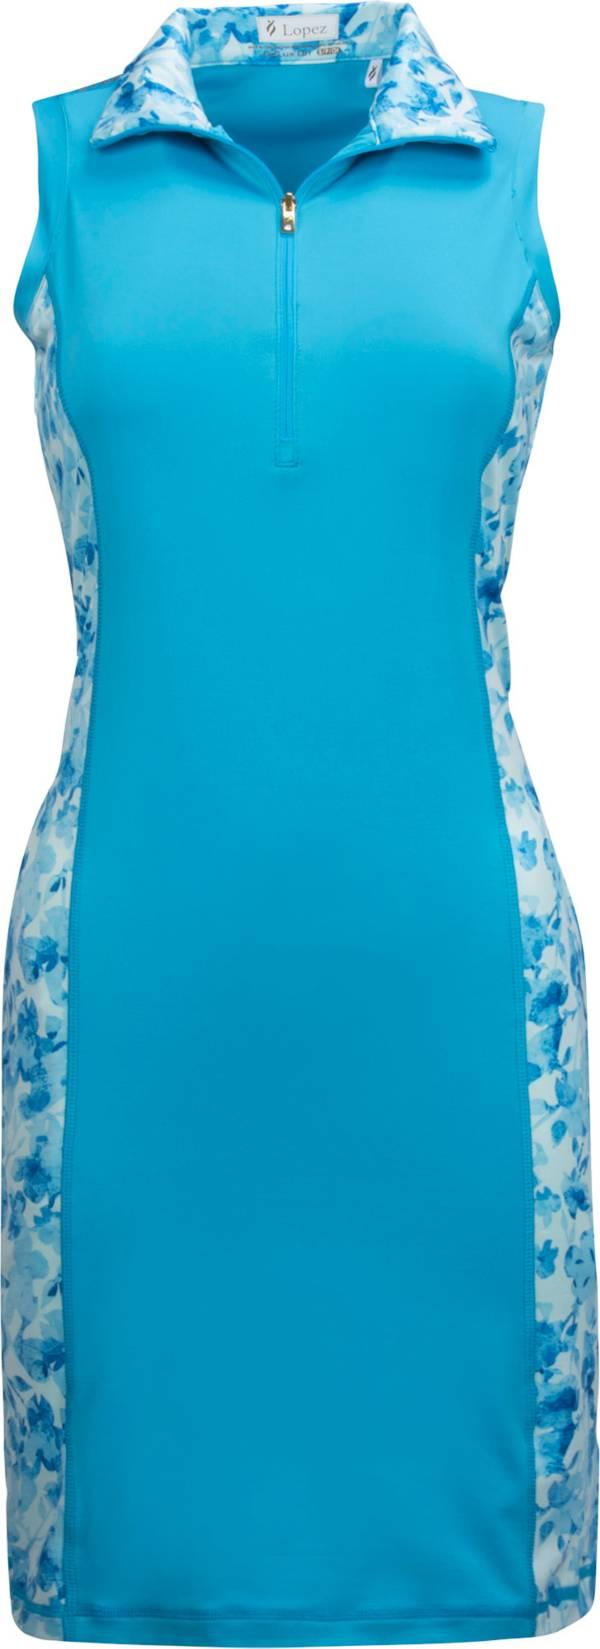 Nancy Lopez Women's Glimmer Dress product image